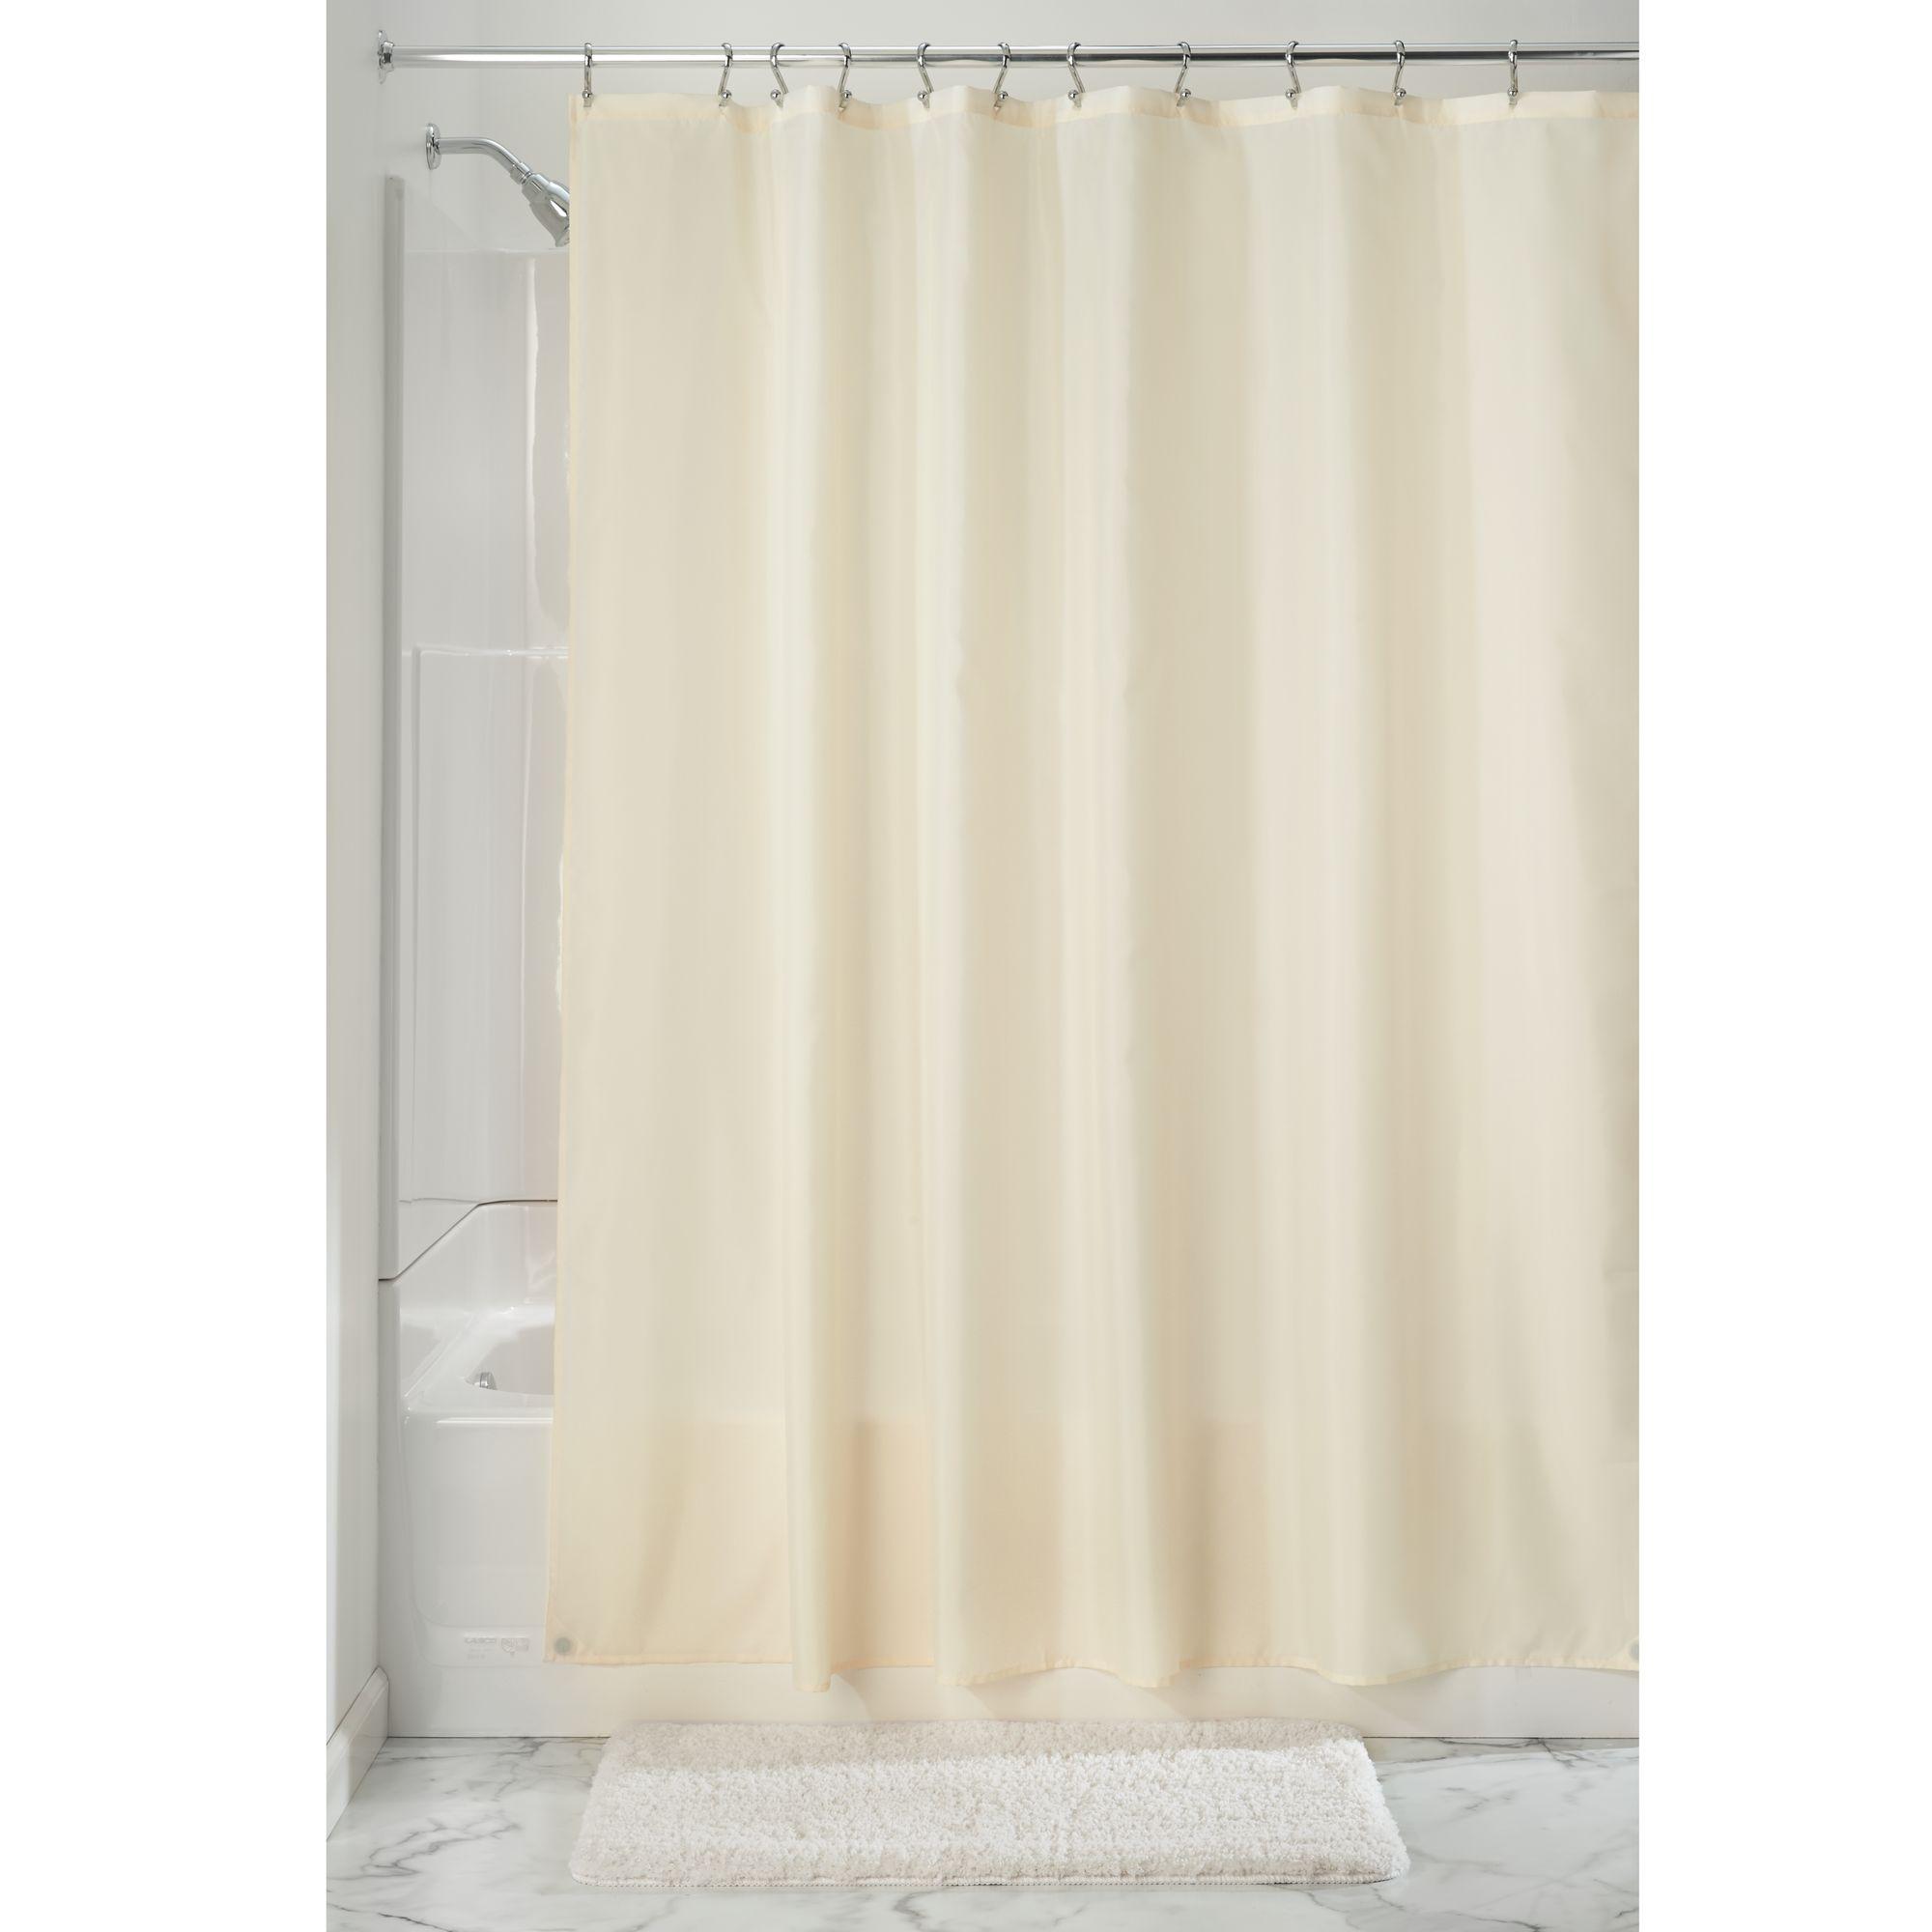 Interdesign Waterproof Fabric Shower Curtain Liner Standard 72 X